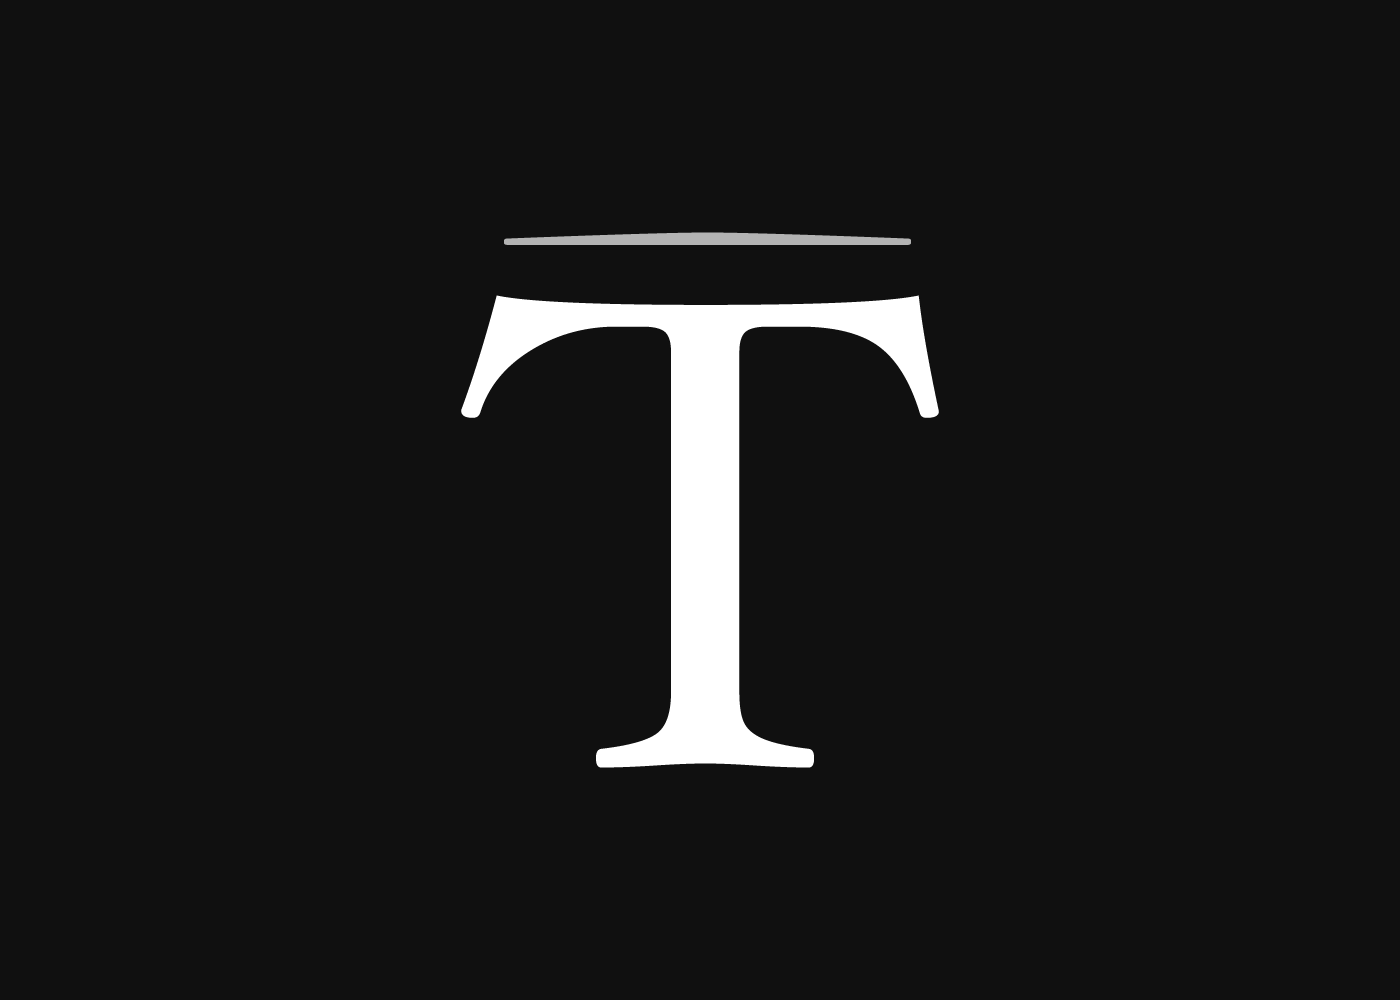 thrive-icon-01